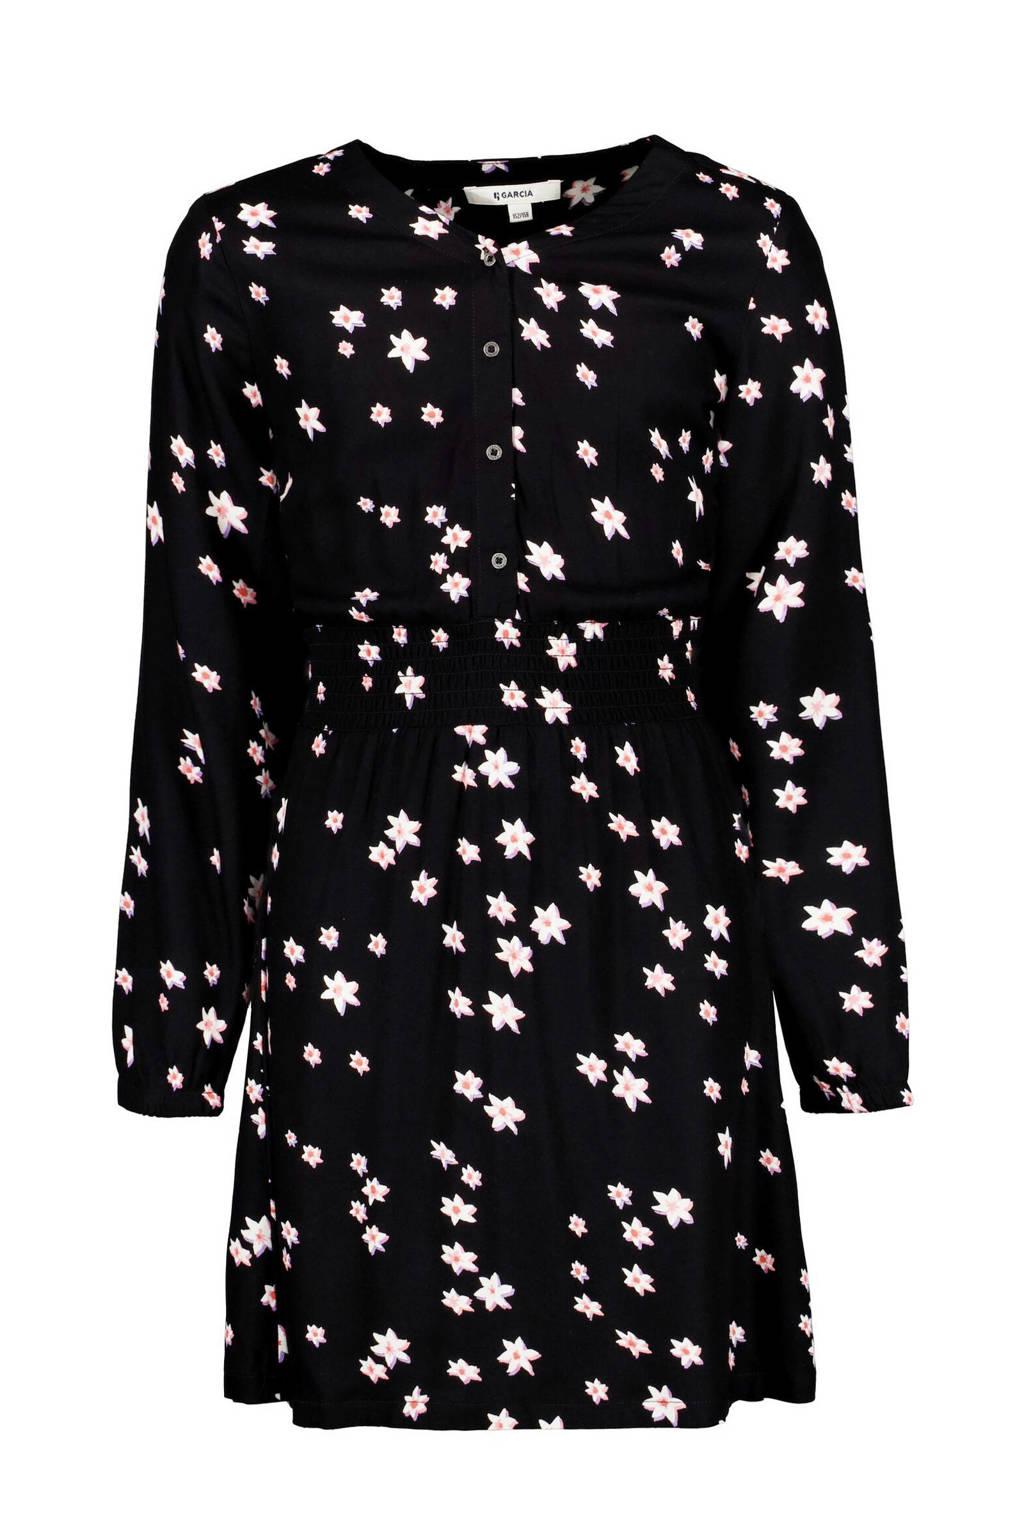 Garcia gebloemde jurk zwart/roze, Zwart/roze